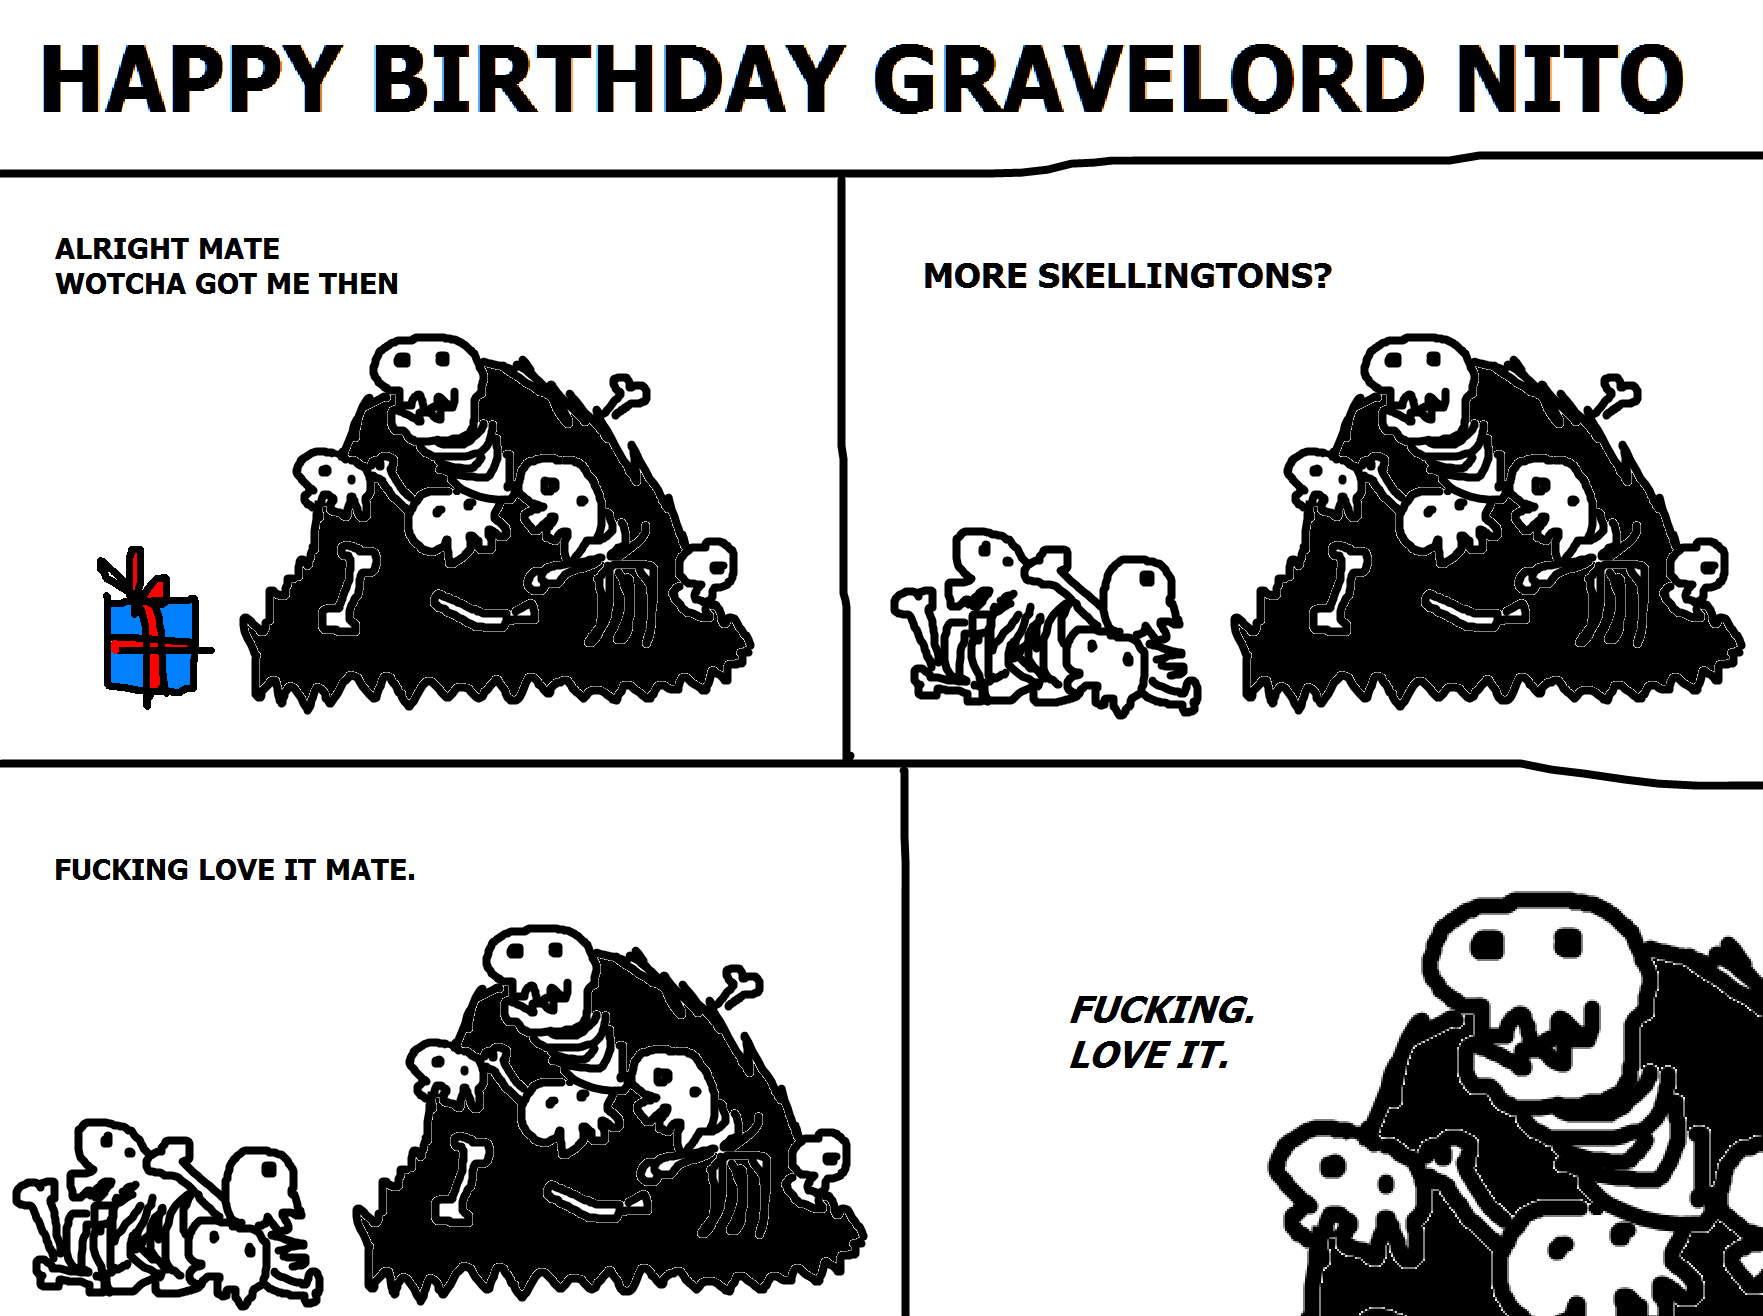 280. Happy Birthday Gravelord Nito